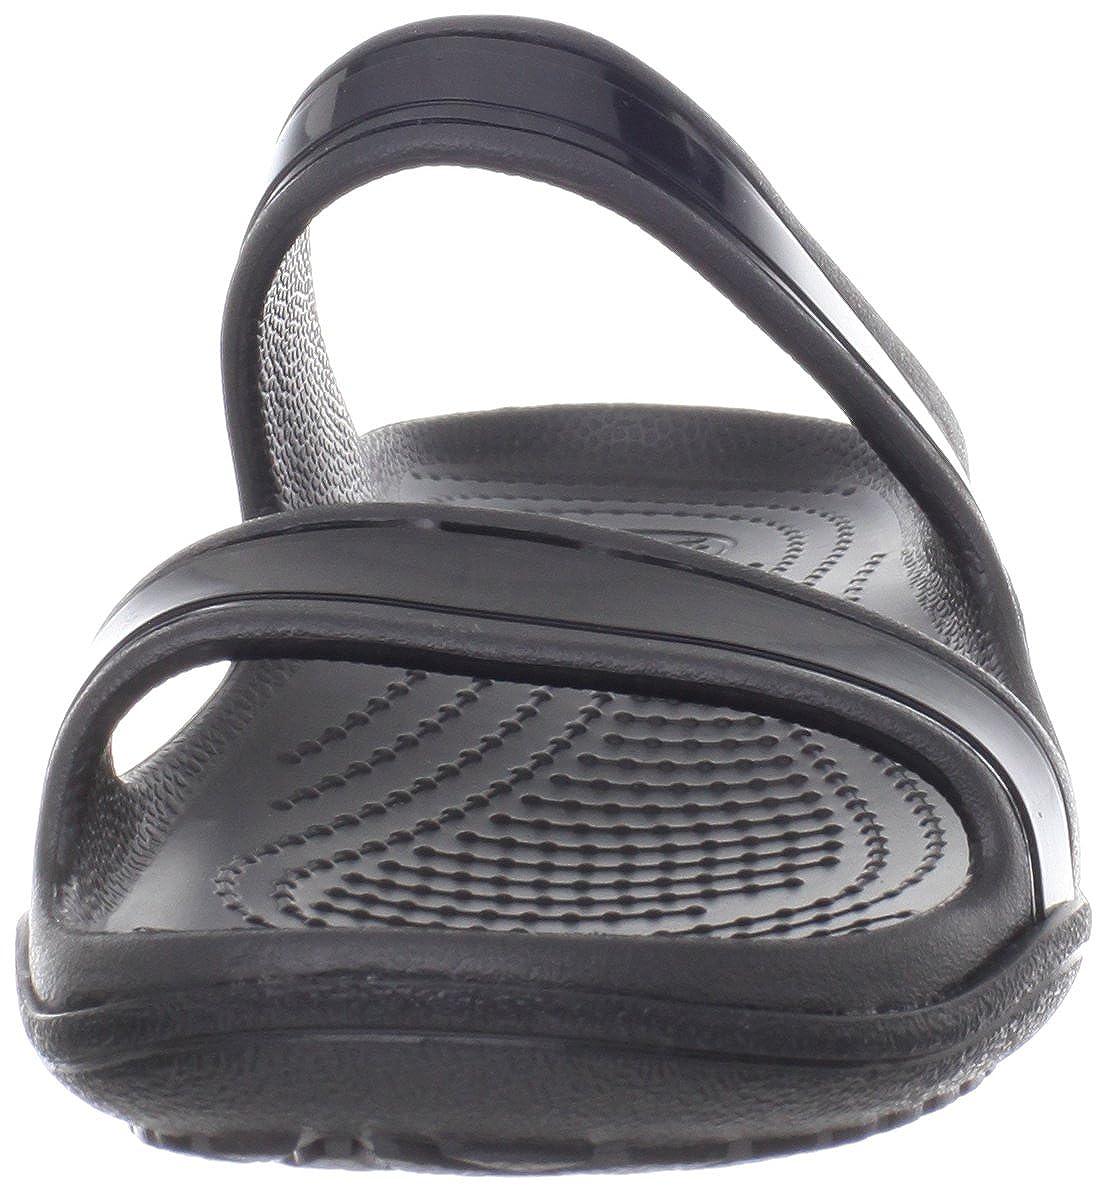 7b923d2f295d82 crocs Patra II Women Sandal in Black  Buy Online at Low Prices in India -  Amazon.in